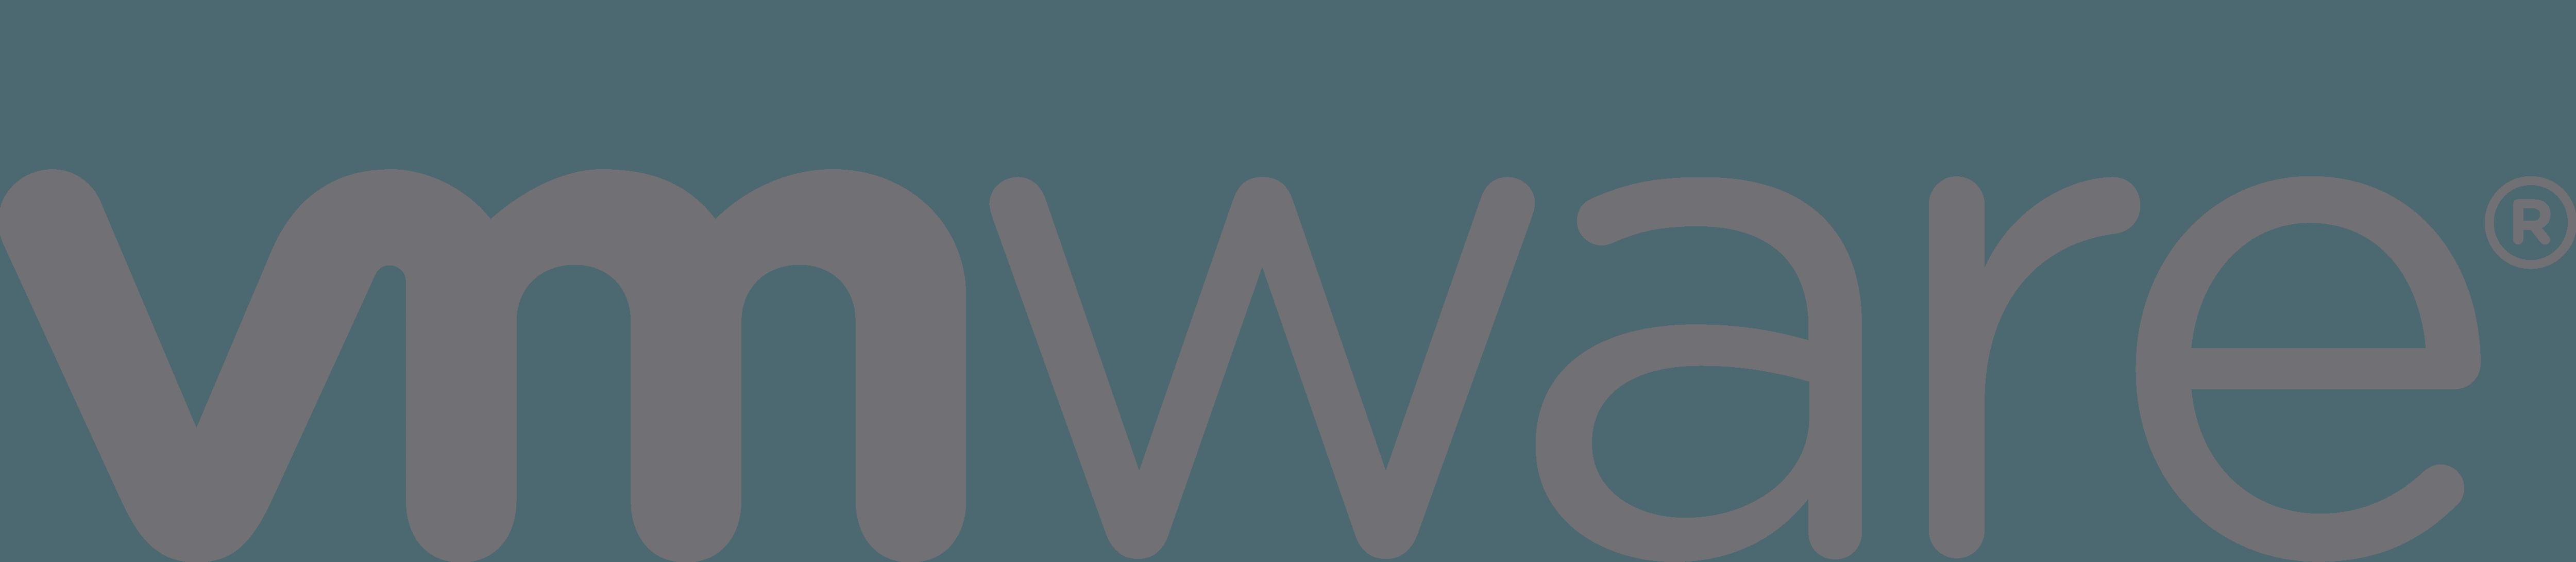 Vmware Logo - Pluspng